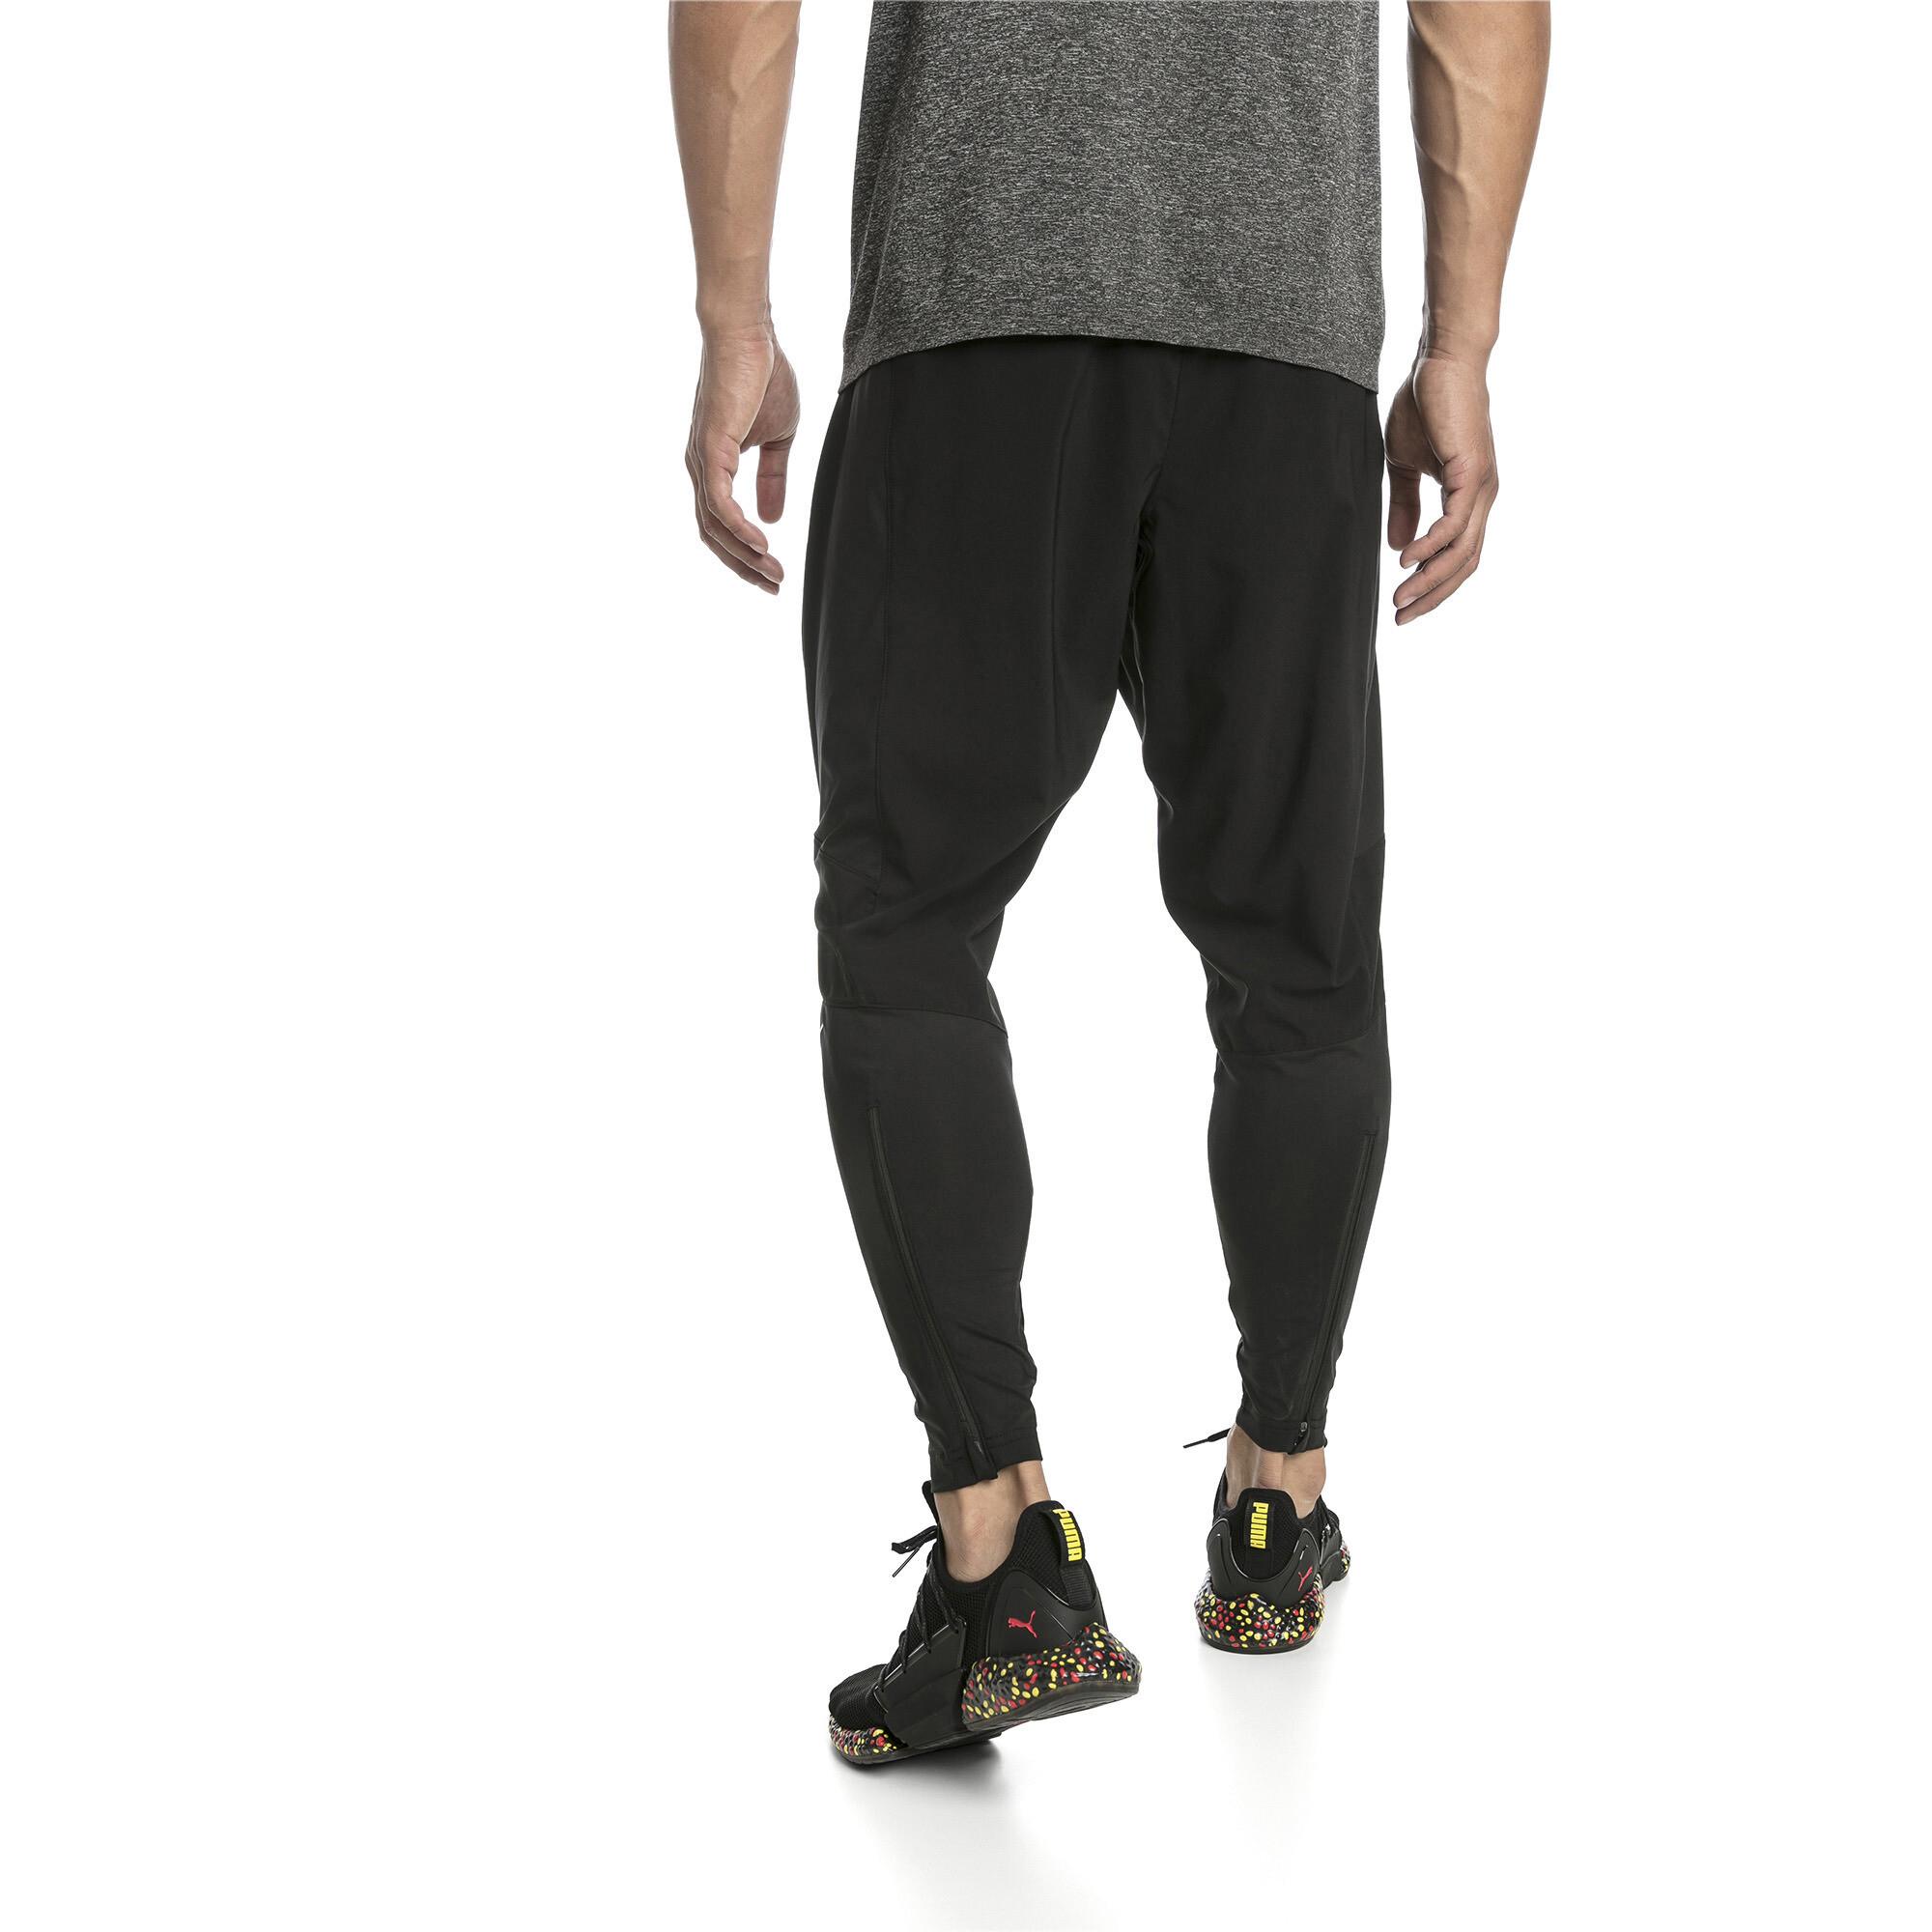 Image Puma NeverRunBack Tapered Men's Training Pants #2